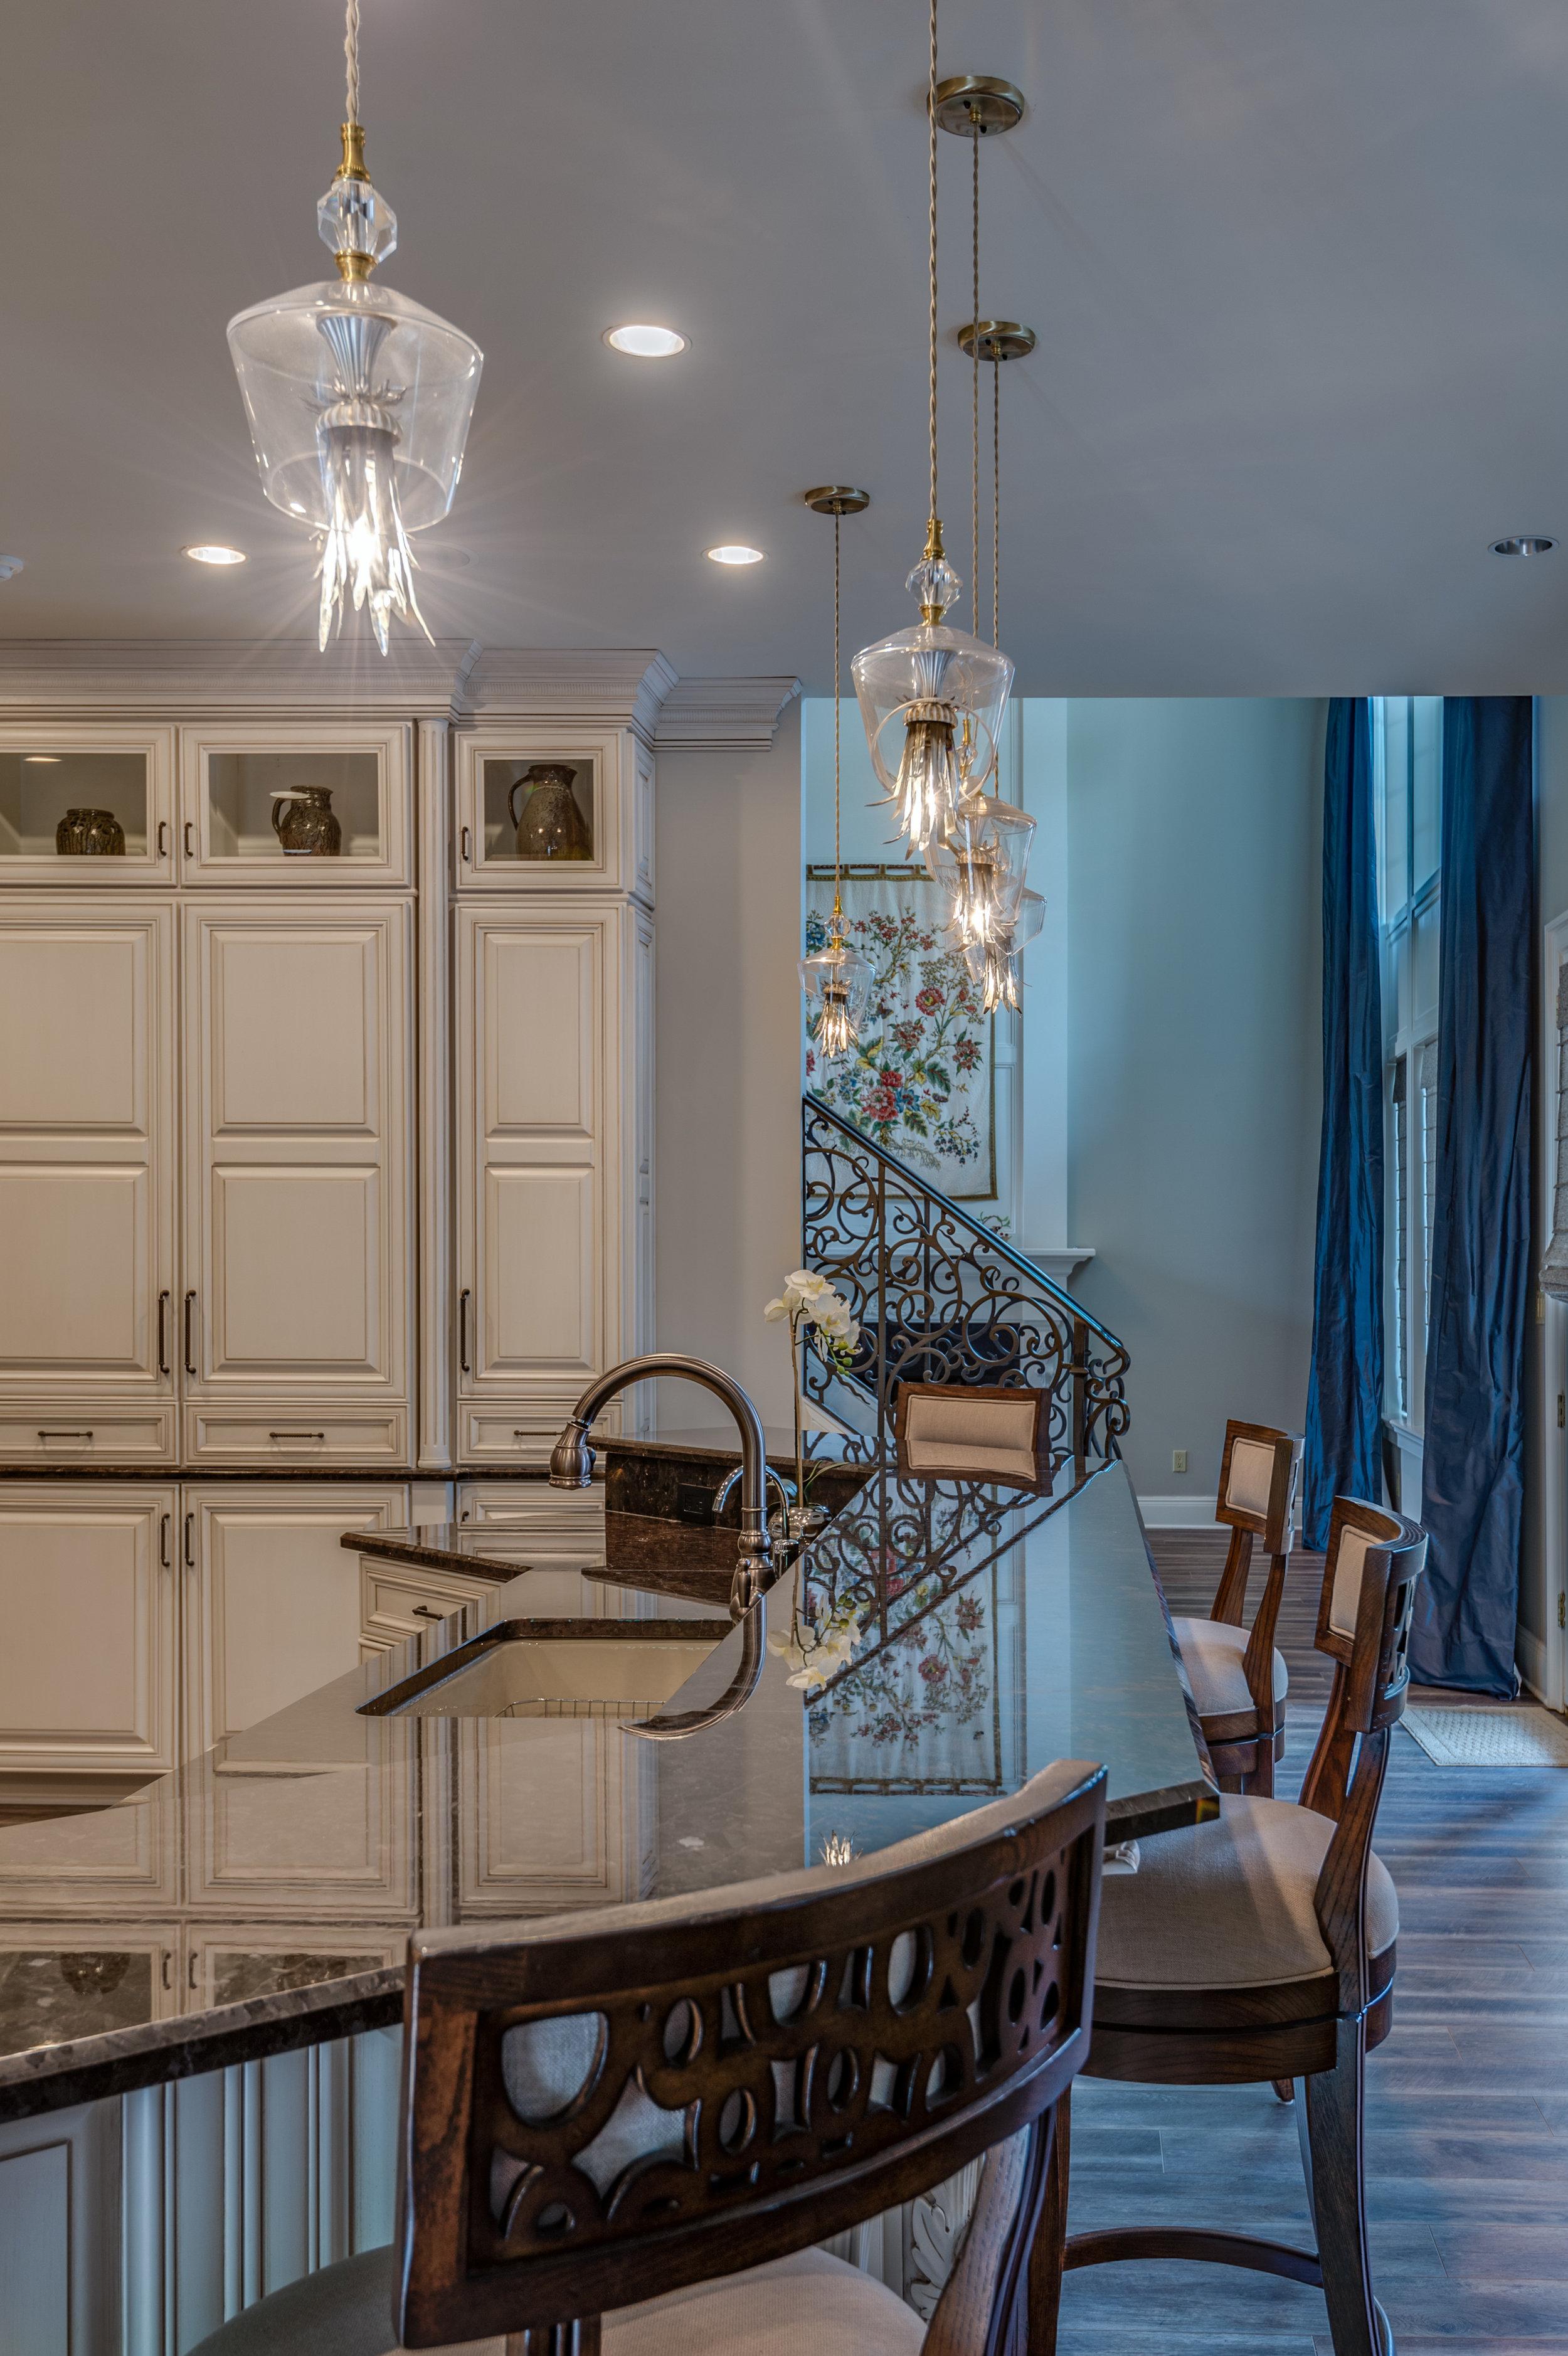 kitchen pendant lighting new orleans home interiors khb interiors